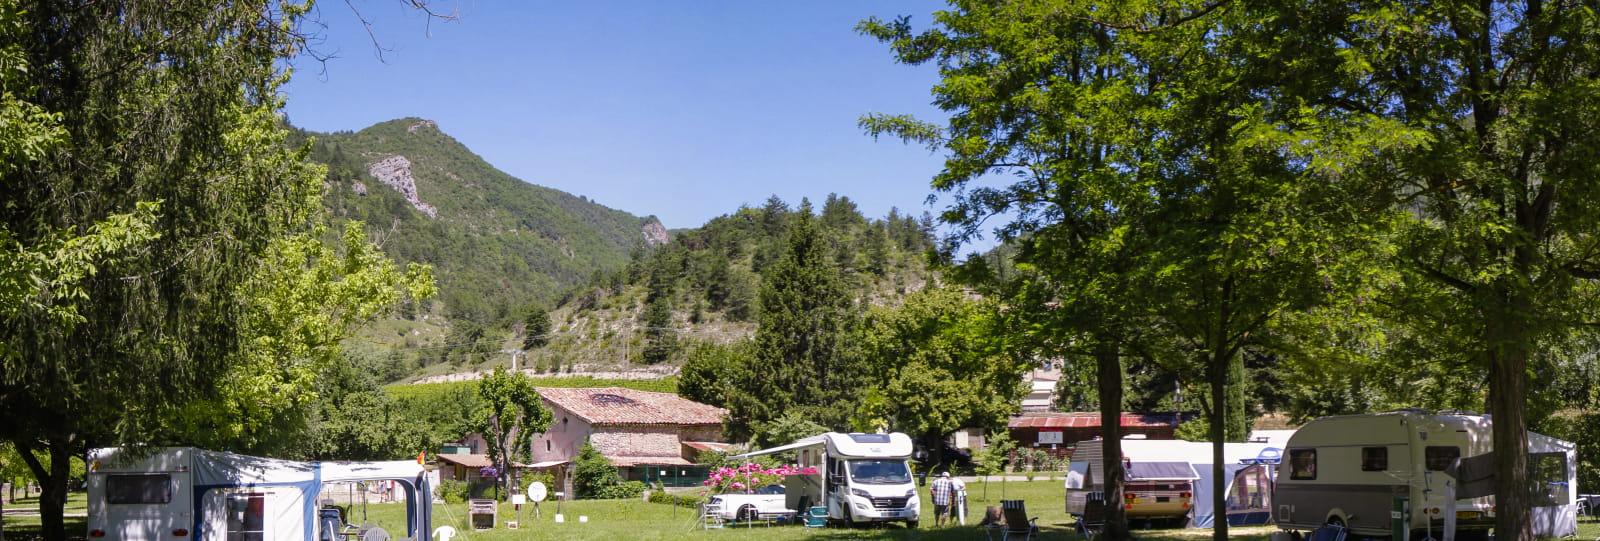 Camping de la Clairette